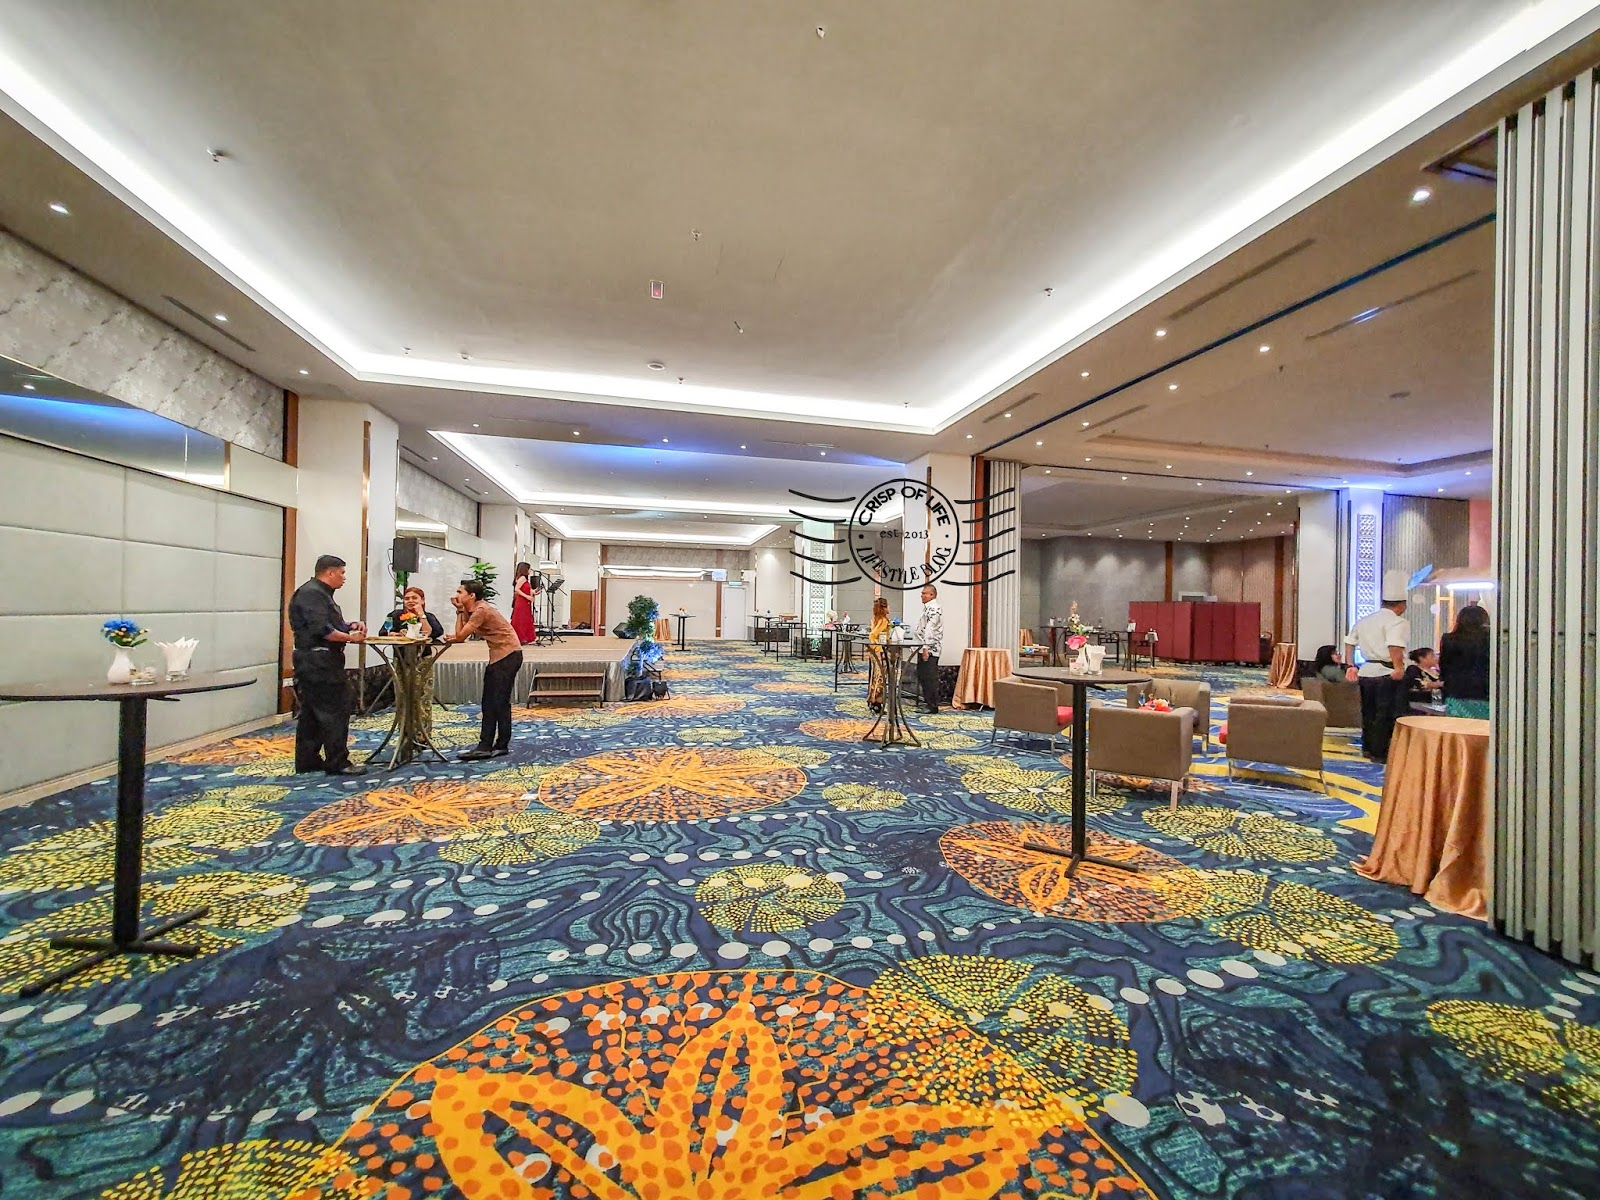 Ixora Hotel Business Cocktail cum Launching of New Baba & Nyonya Hall